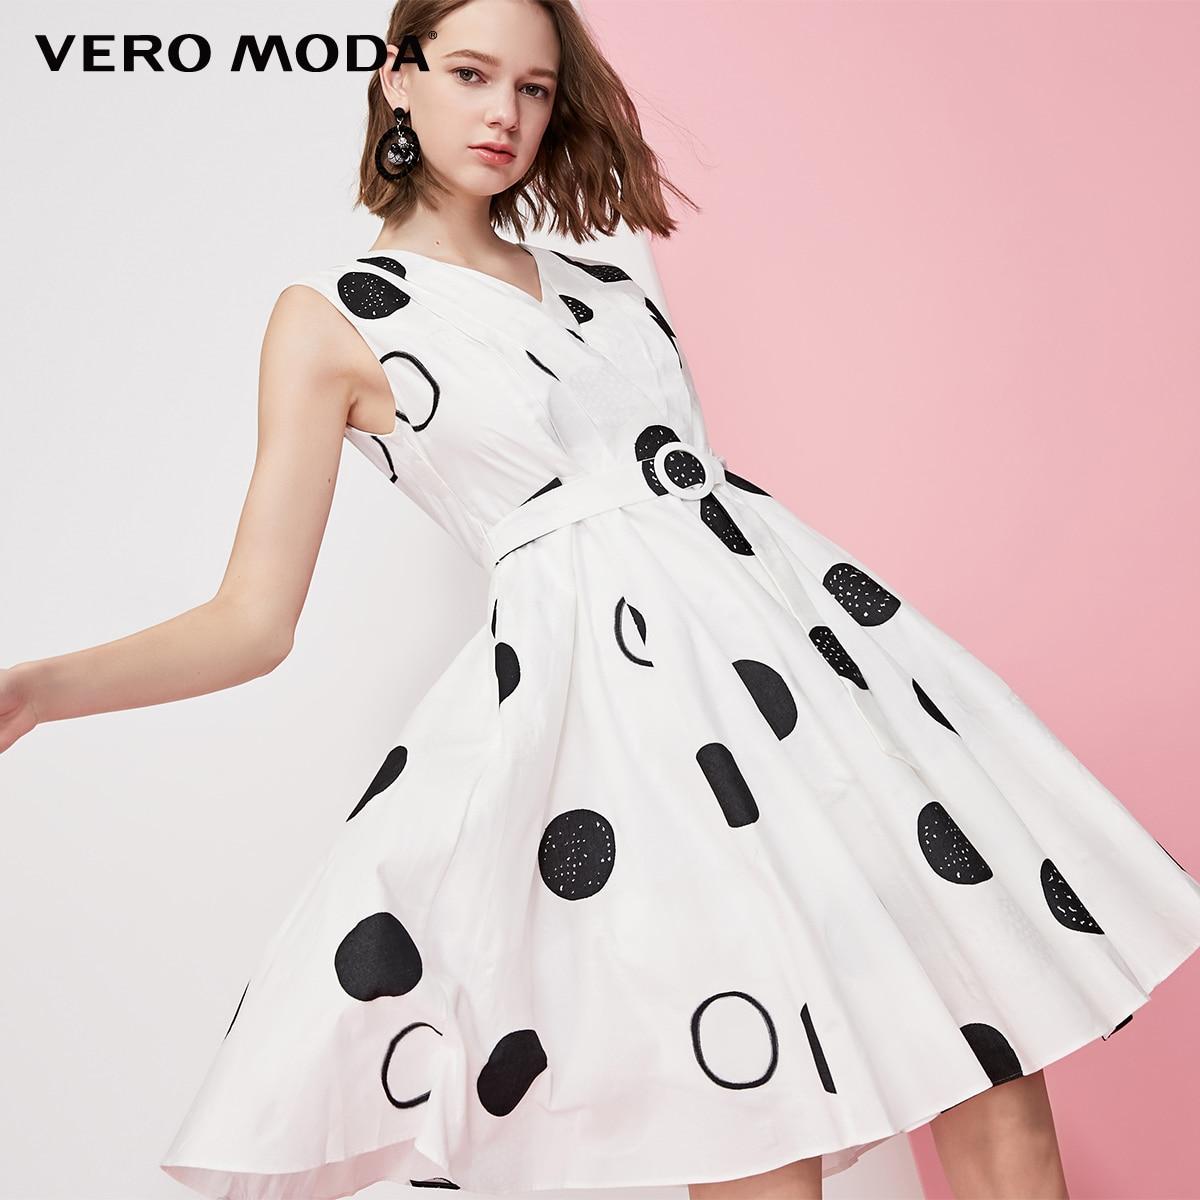 Vero Moda Women's Vintage Cotton Polka Dots Print V-neckline Sleeveless Dress | 31927A562